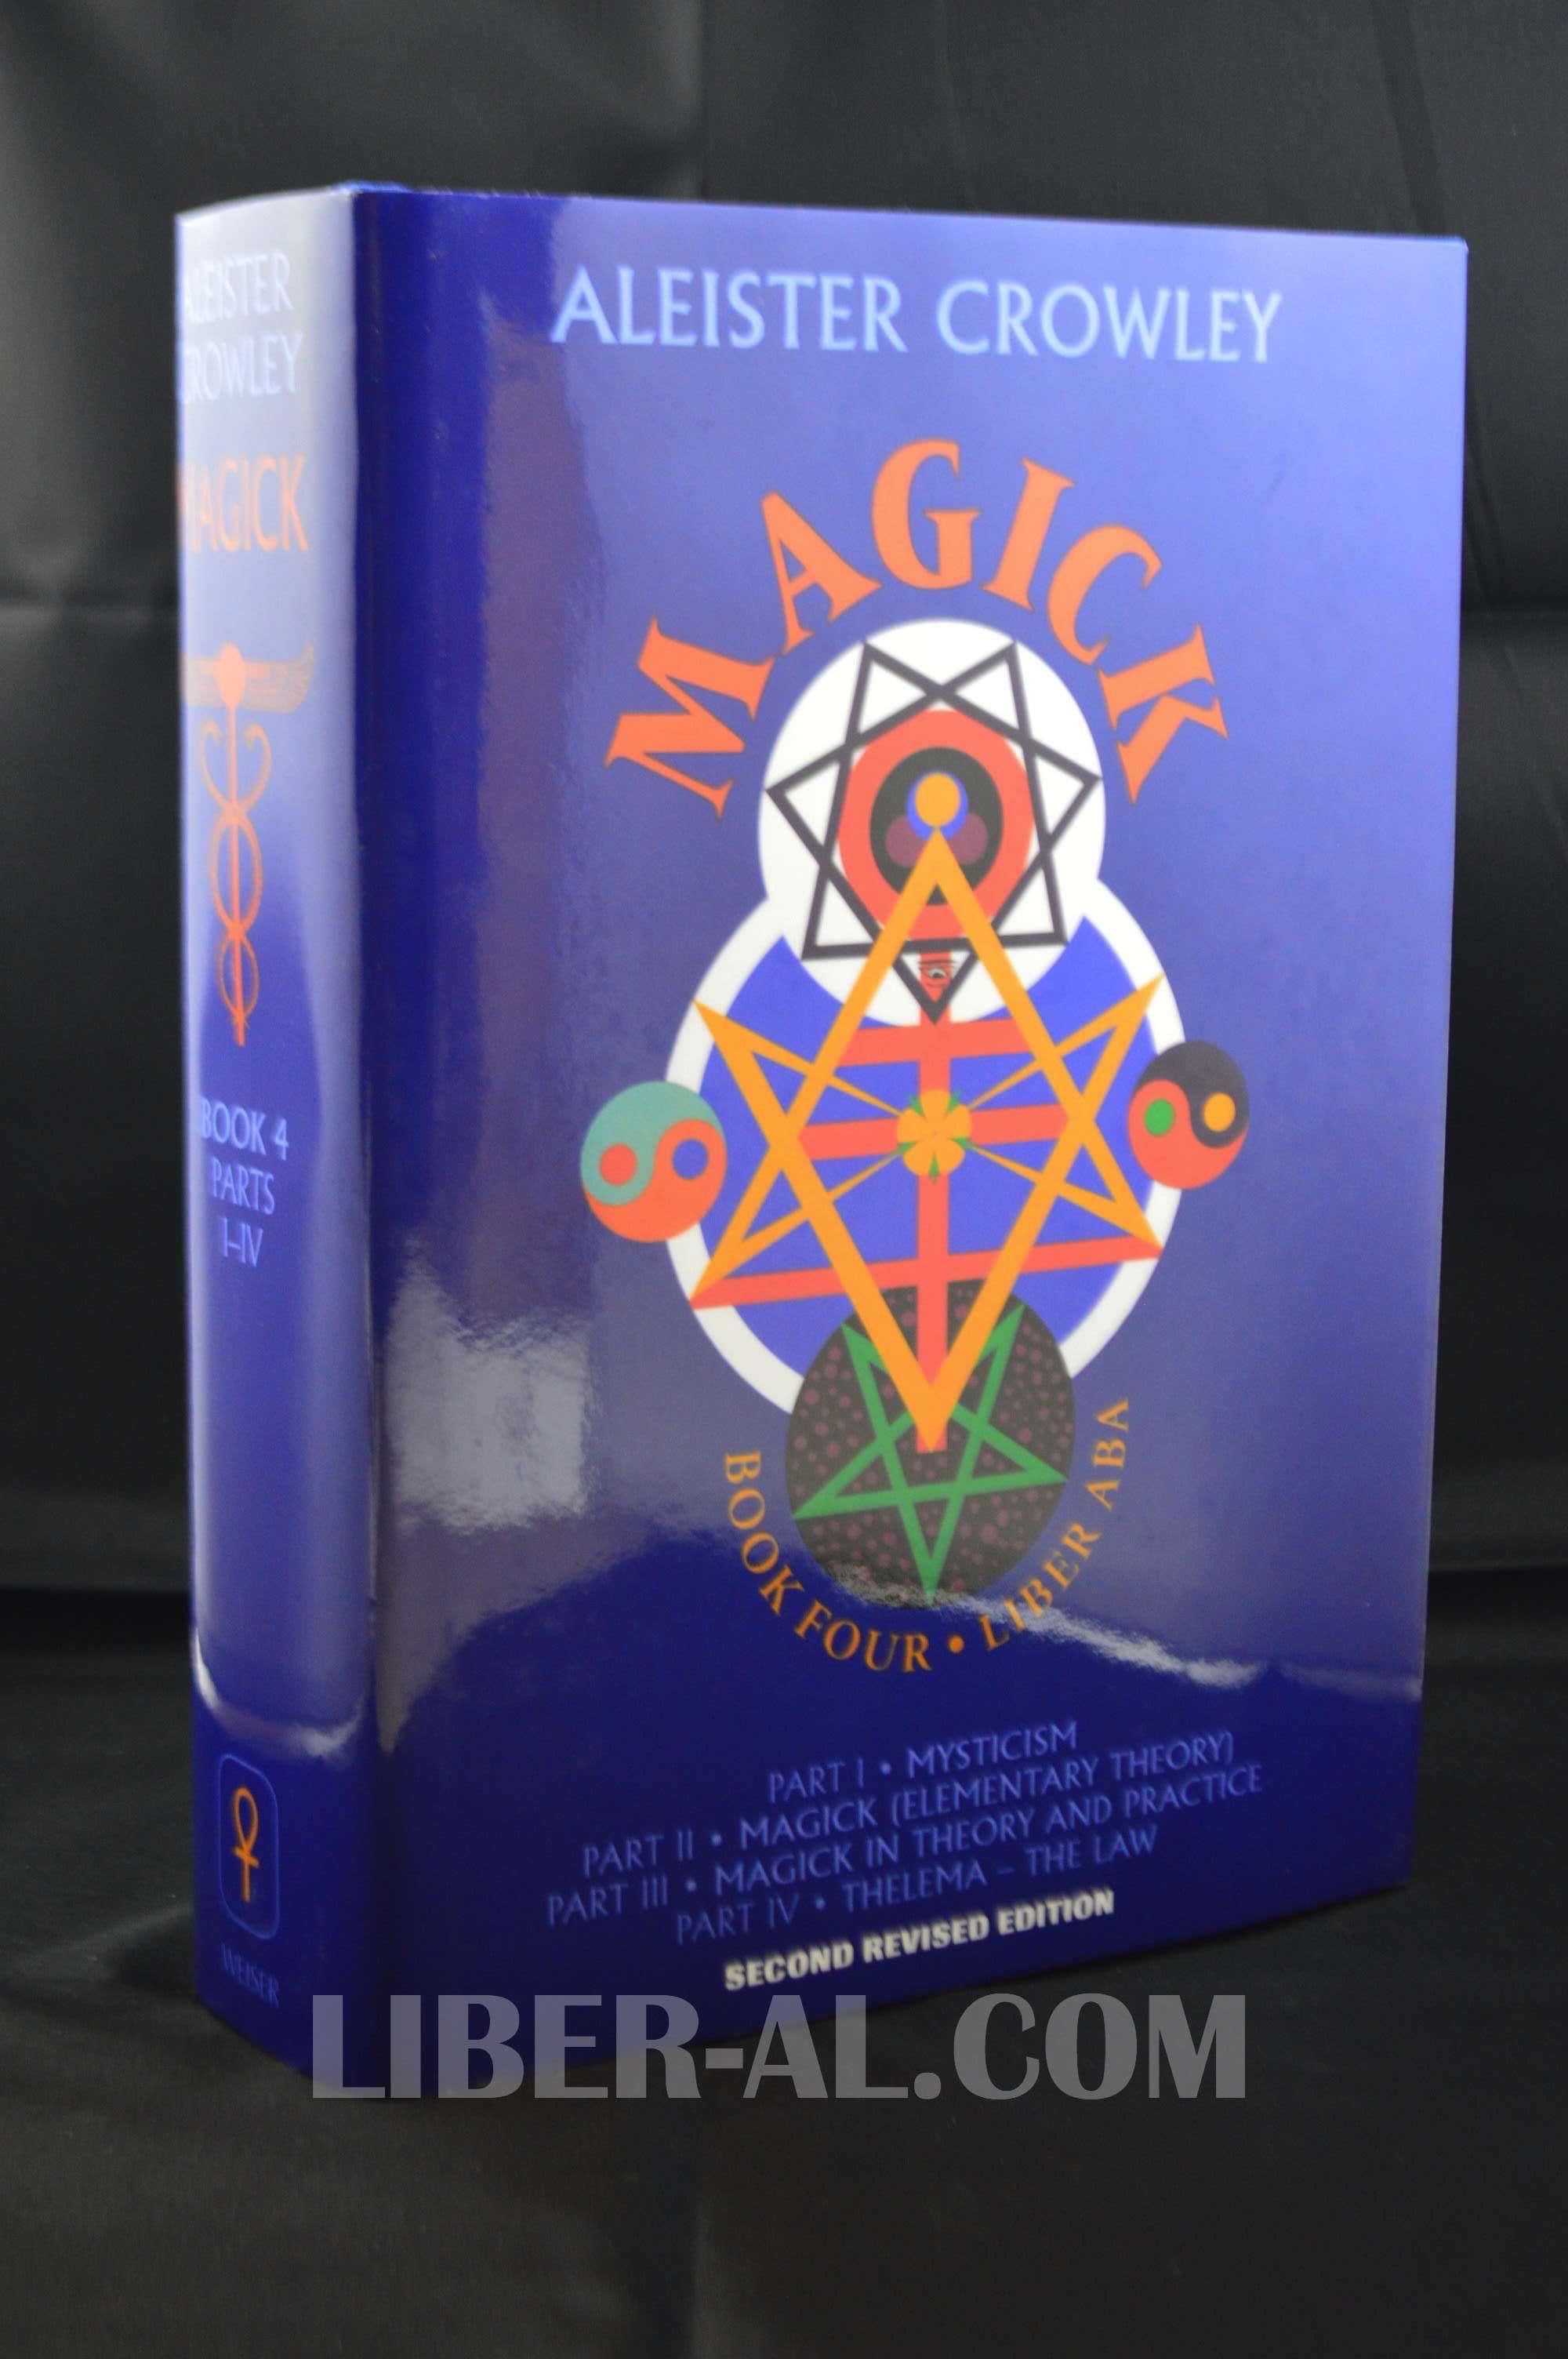 MAGICK LIBER ABA BOOK 4 PDF DOWNLOAD